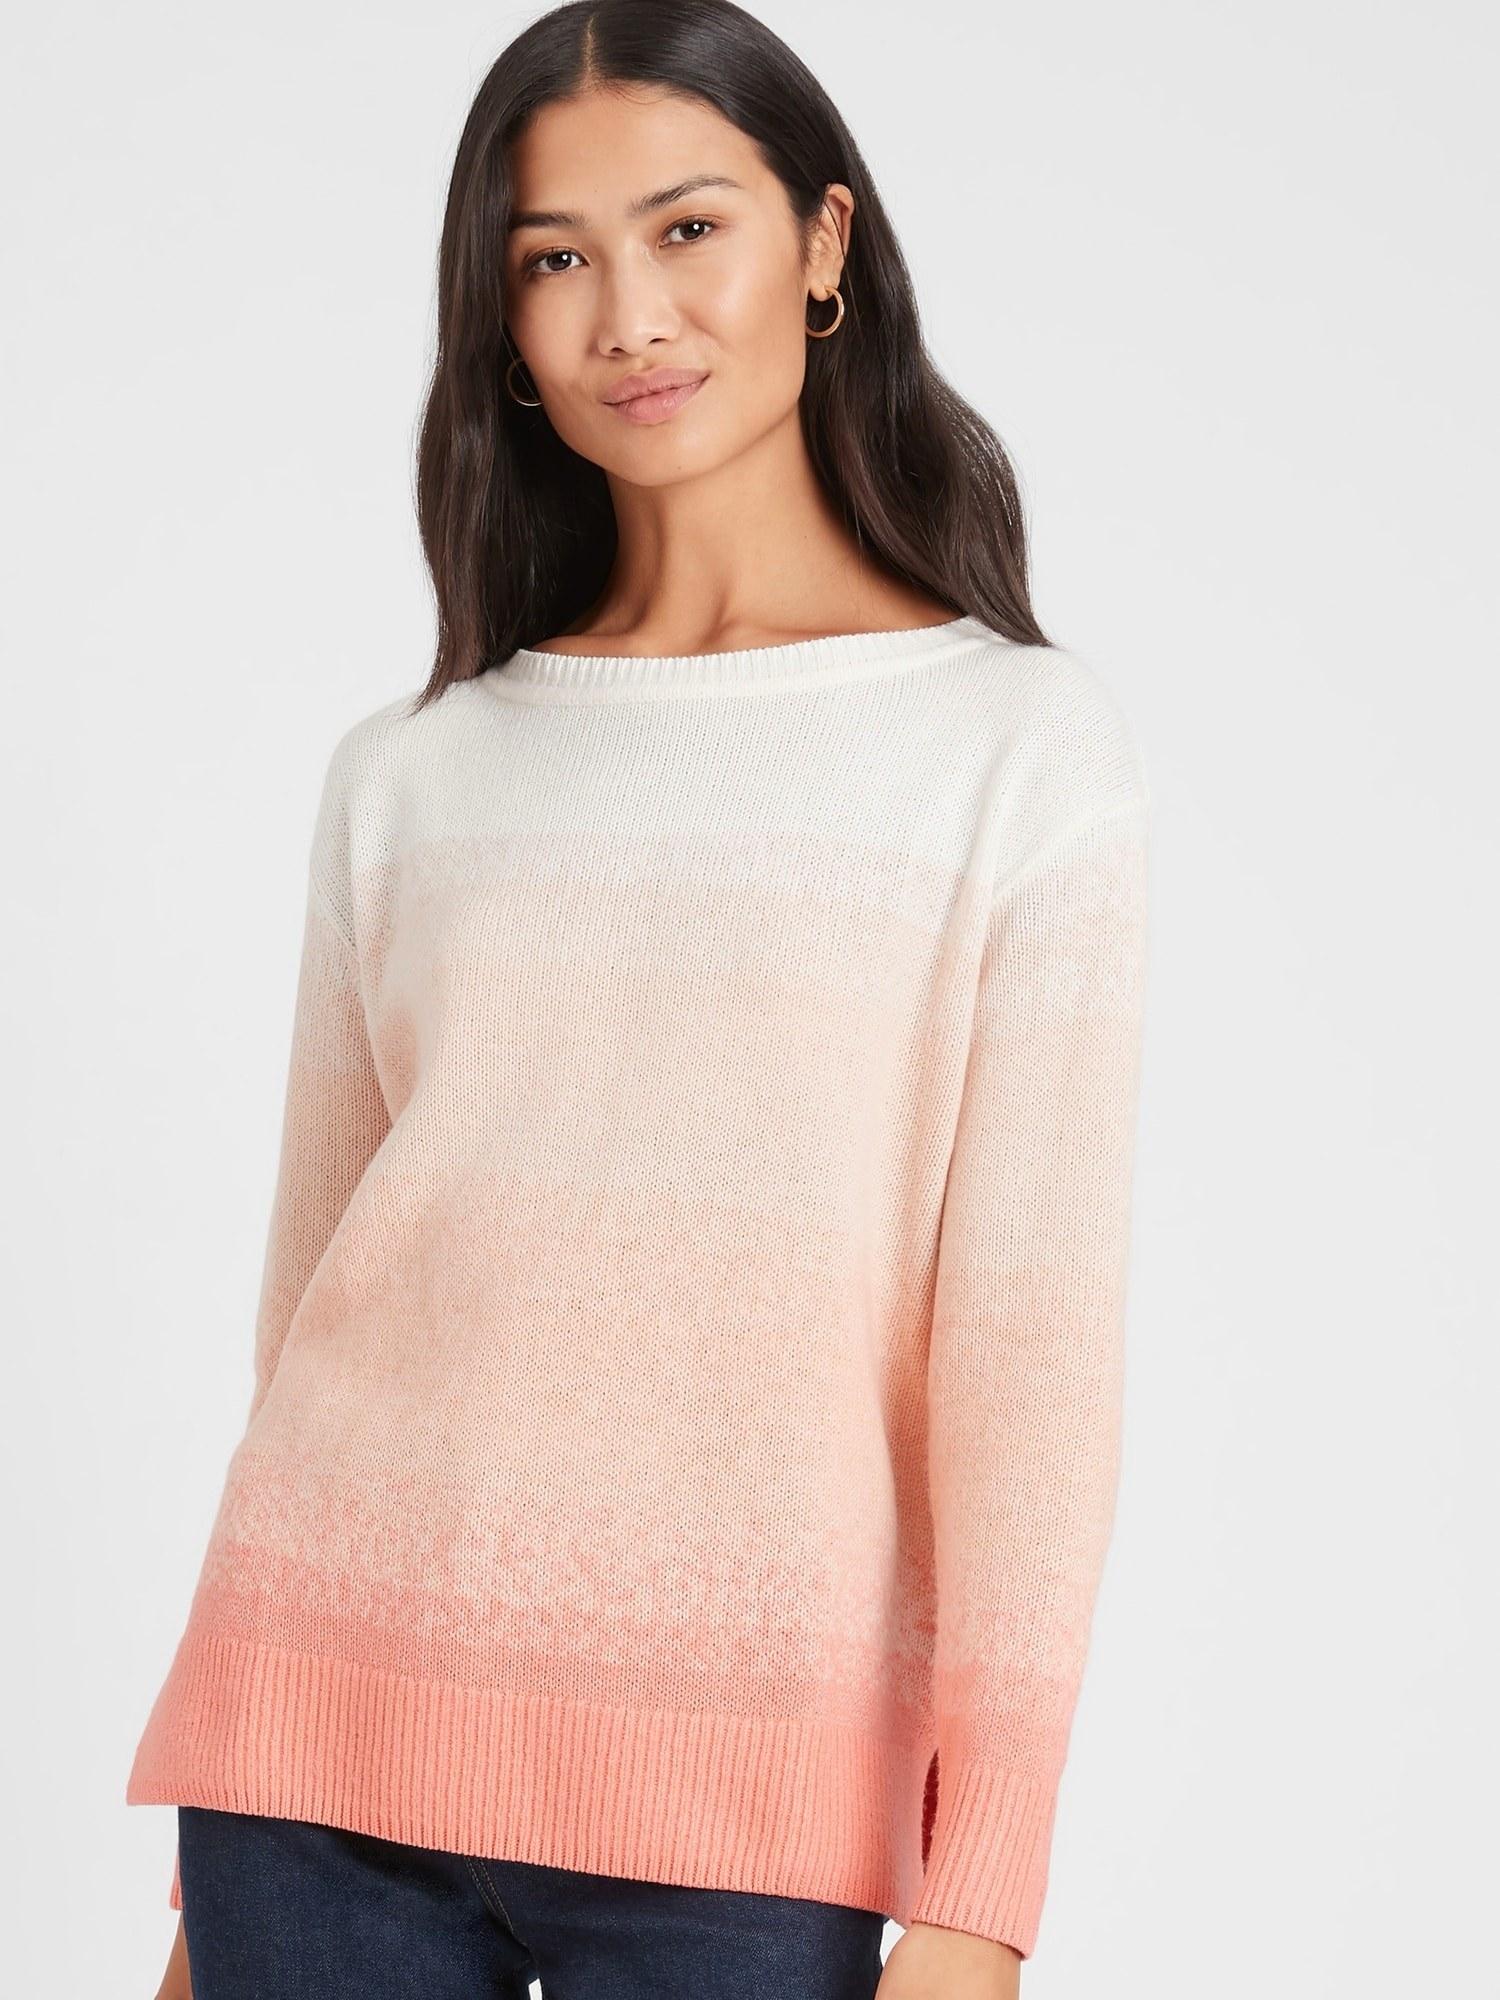 model wearing ombre crewneck sweater in pink sundown